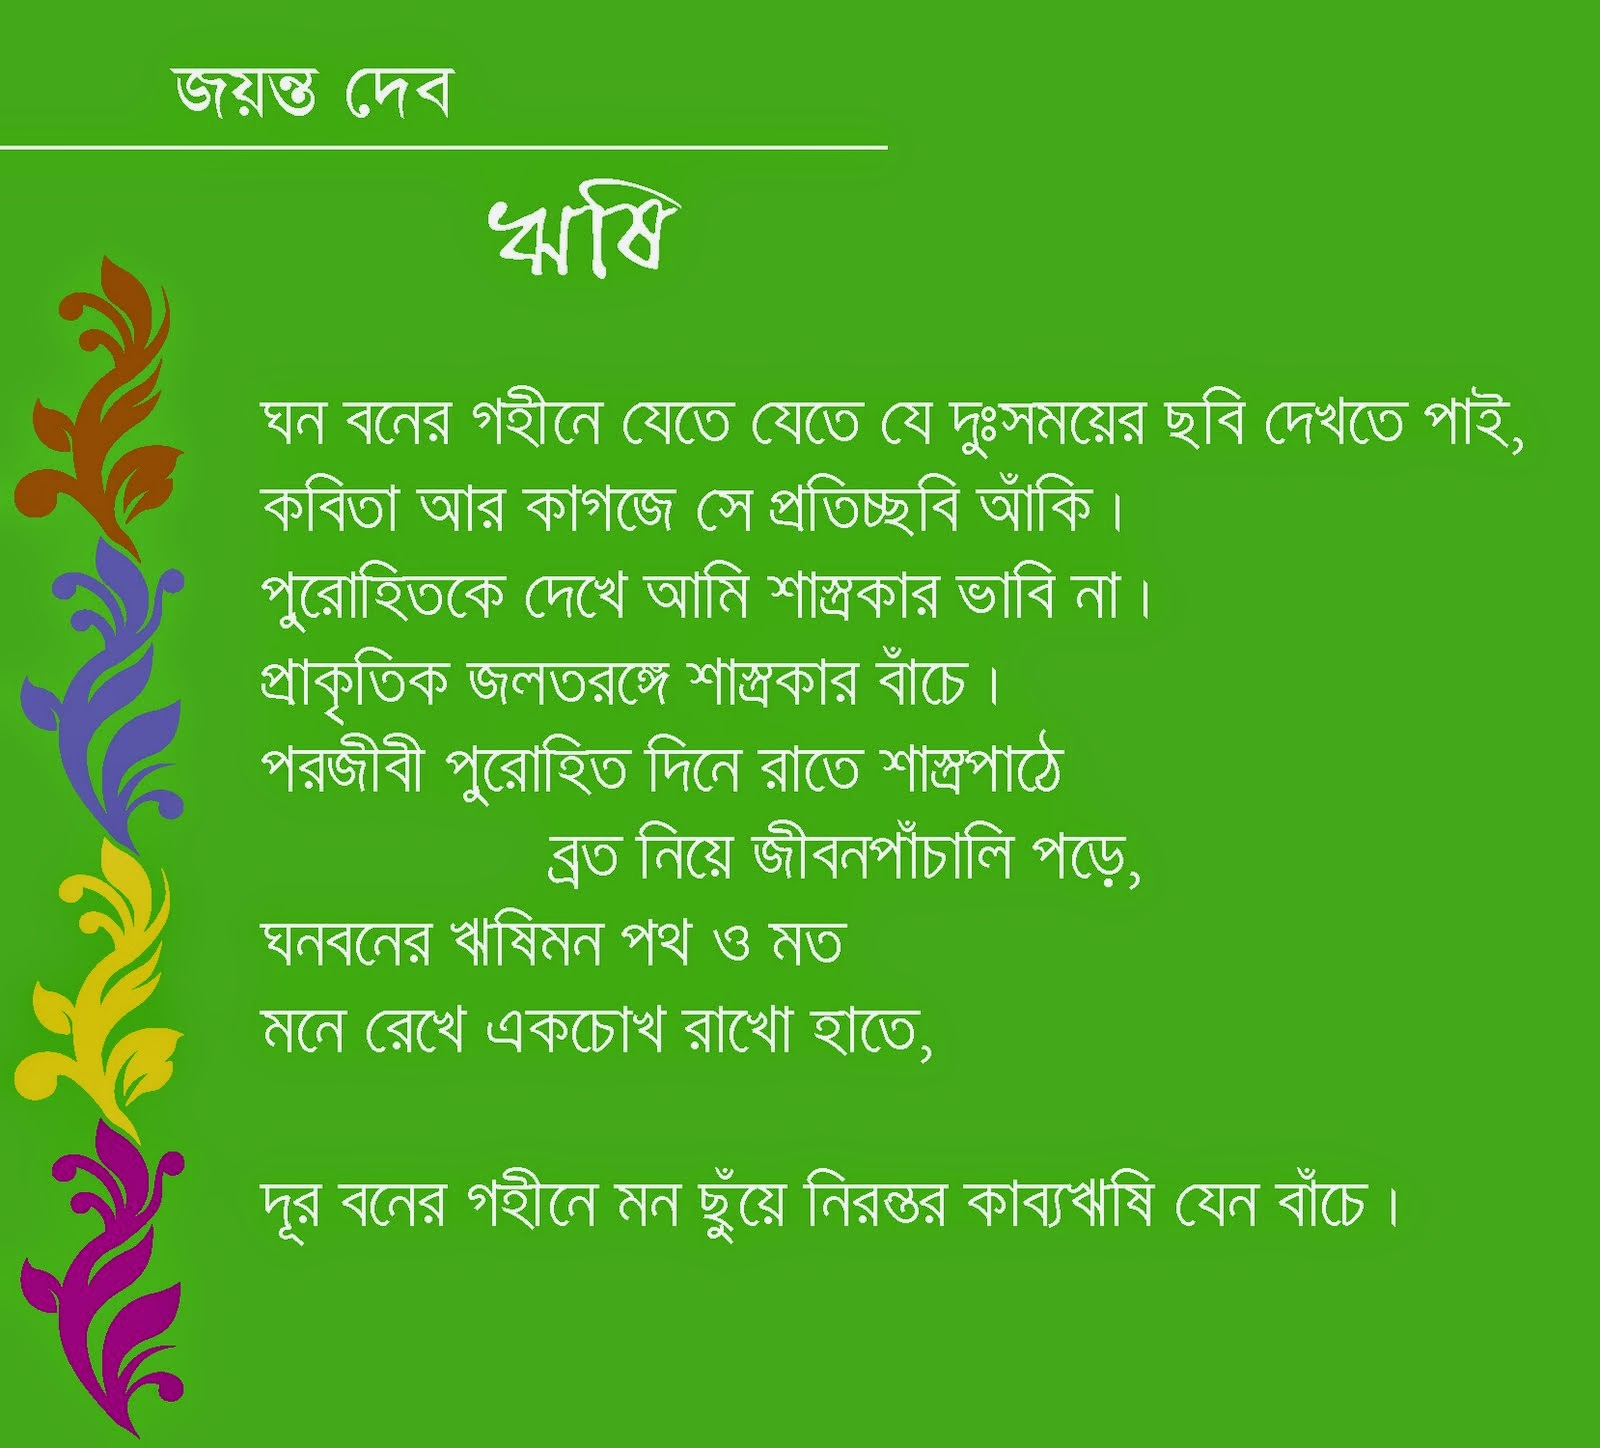 Bangla Kabita Images,bangla Vhalobashar Kabitapctures